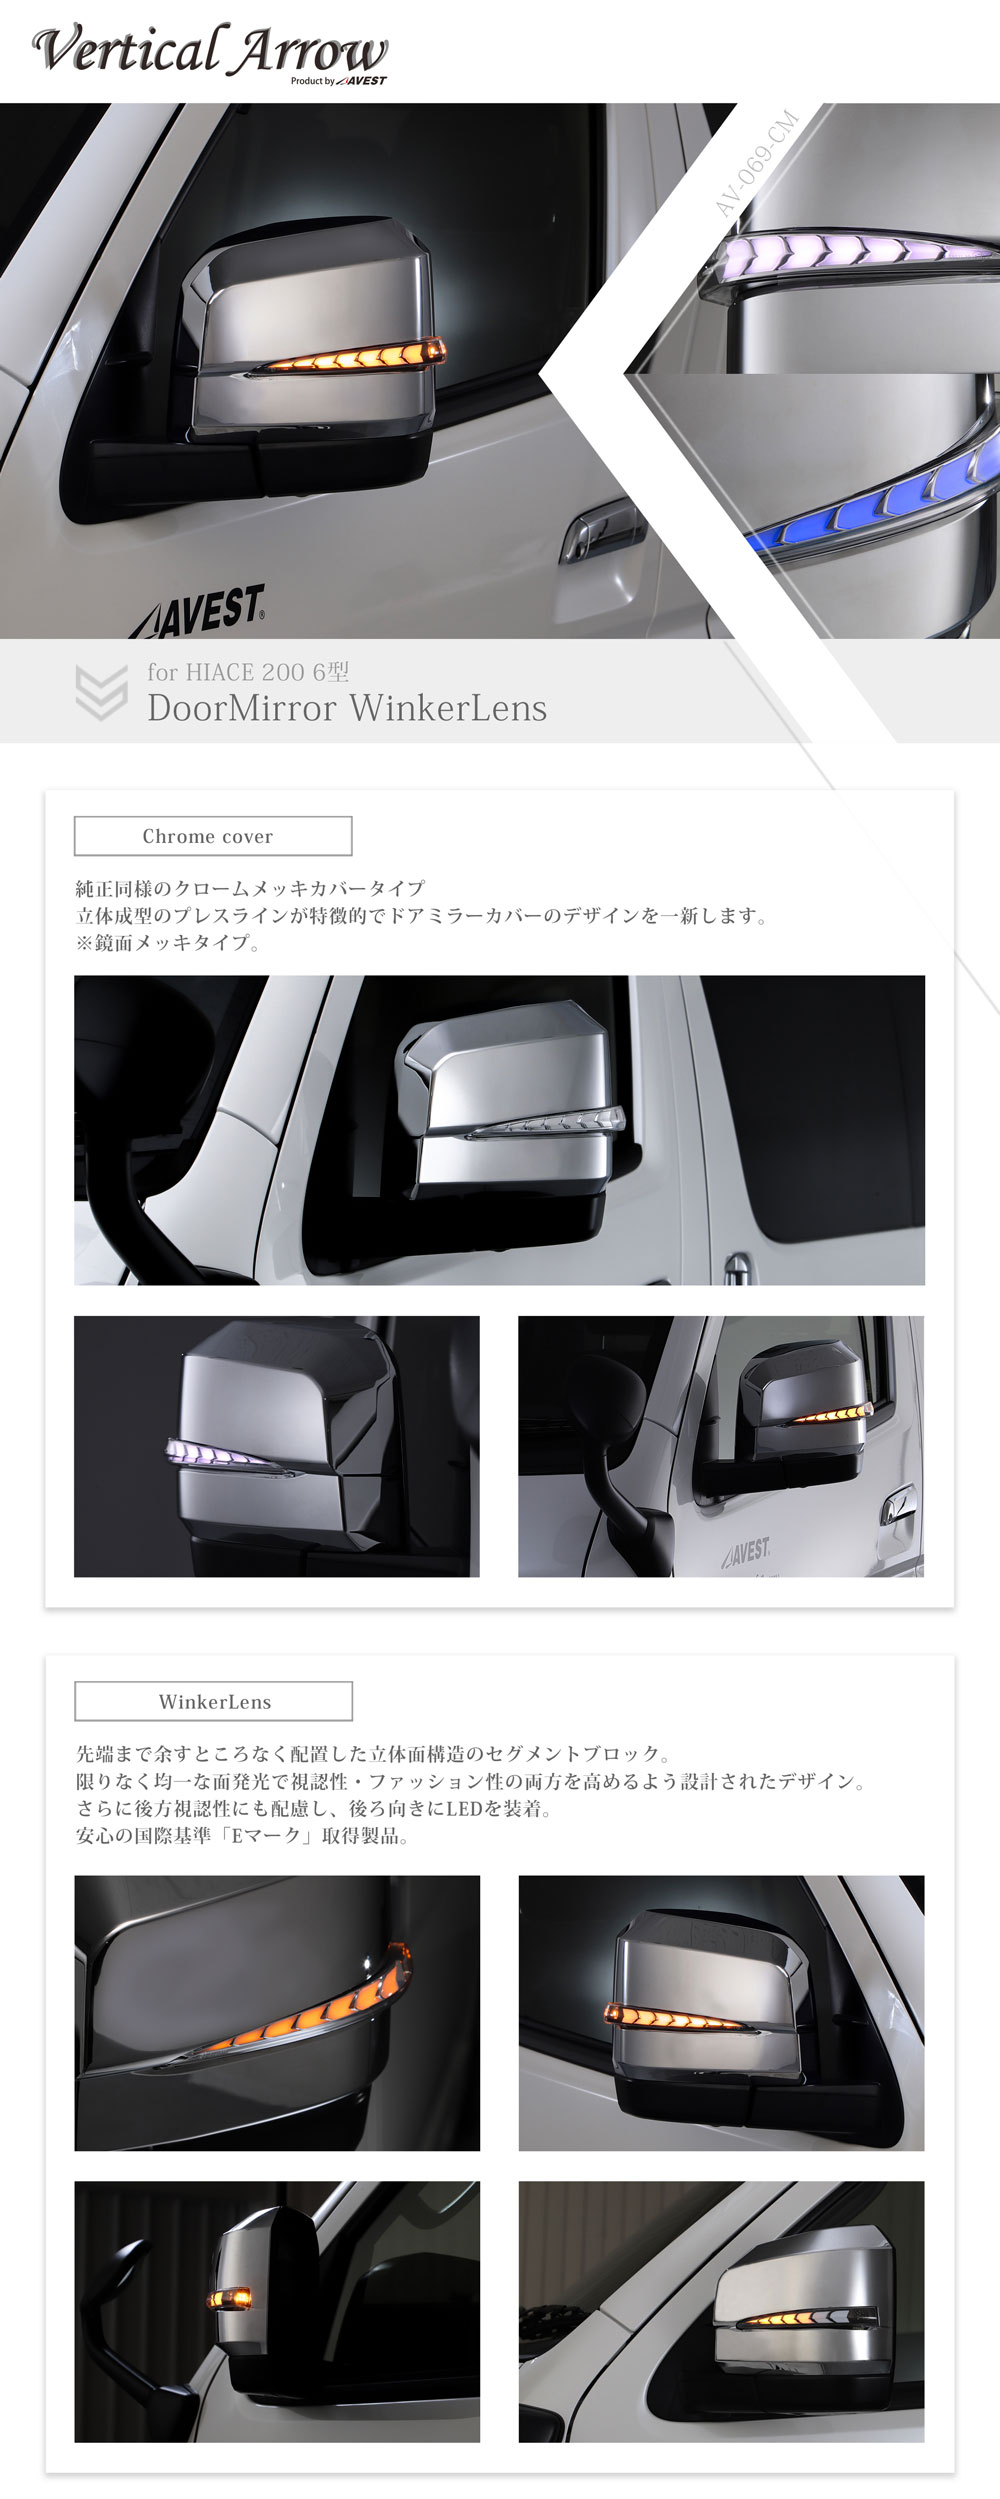 VericalArrow ハイエース/レジアスエース200系6型ドアミラーウインカー&クロームメッキカバー